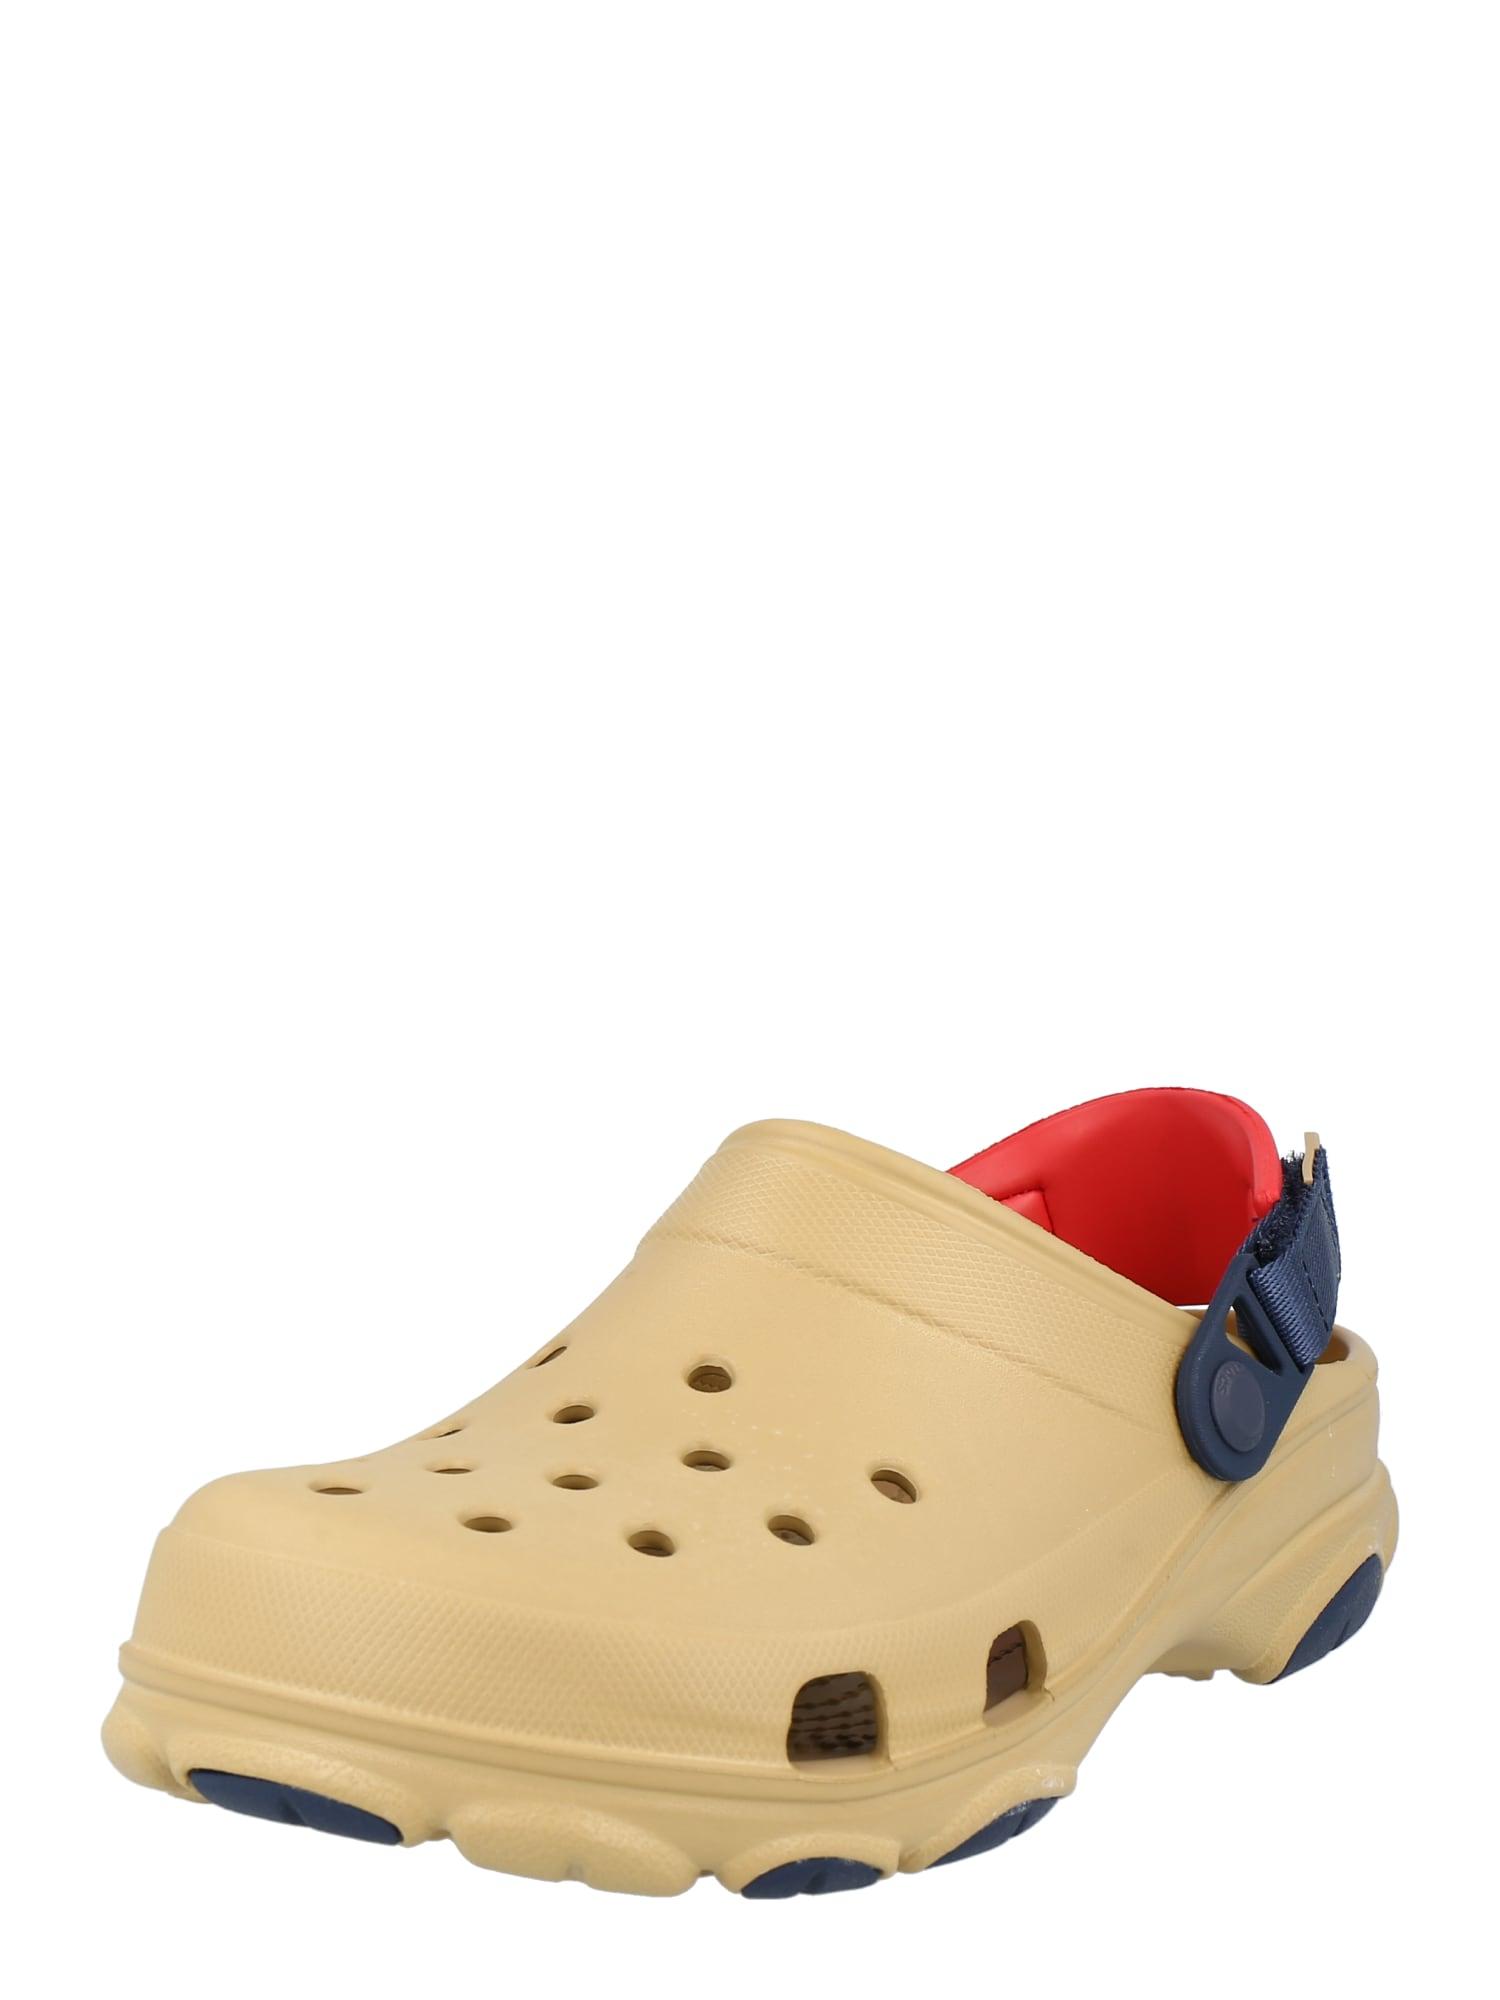 Crocs Sabots 'All Terrain'  - Marron - Taille: M7W9 - male